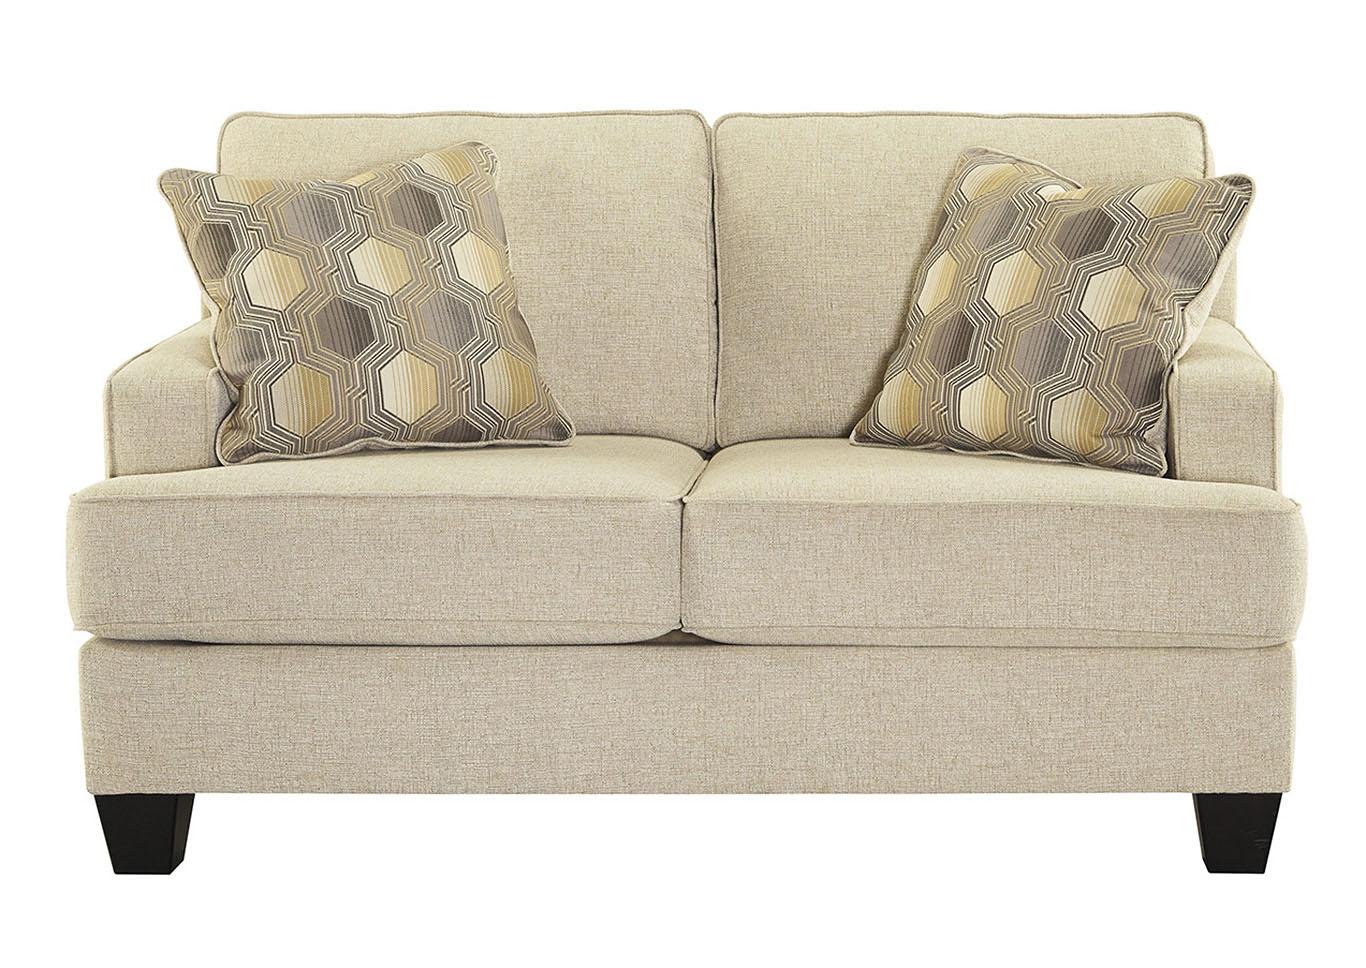 Overstock Furniture Langley Park Catonsville Alexandria Lanham Brielyn Linen Loveseat